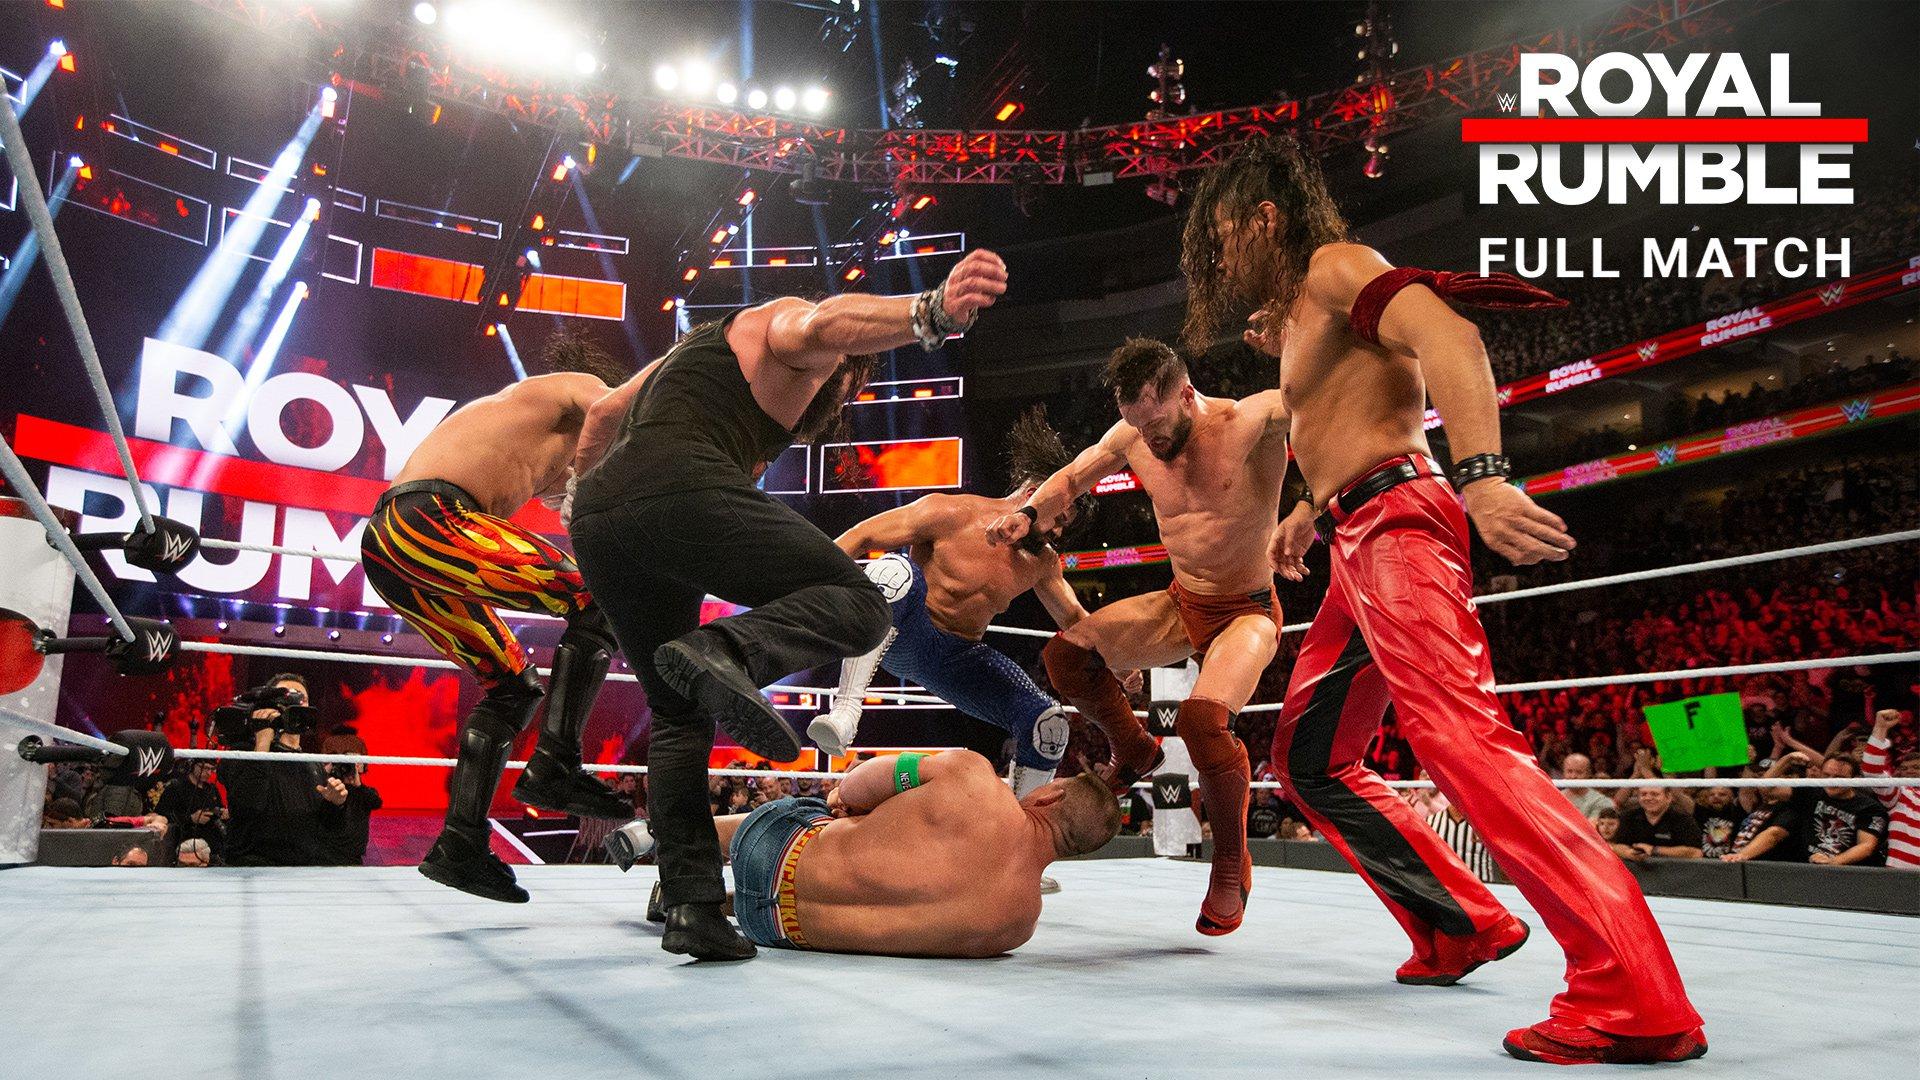 Royal Rumble Match: Royal Rumble 2018 (Match Intégral - Exclusivité WWE Network)